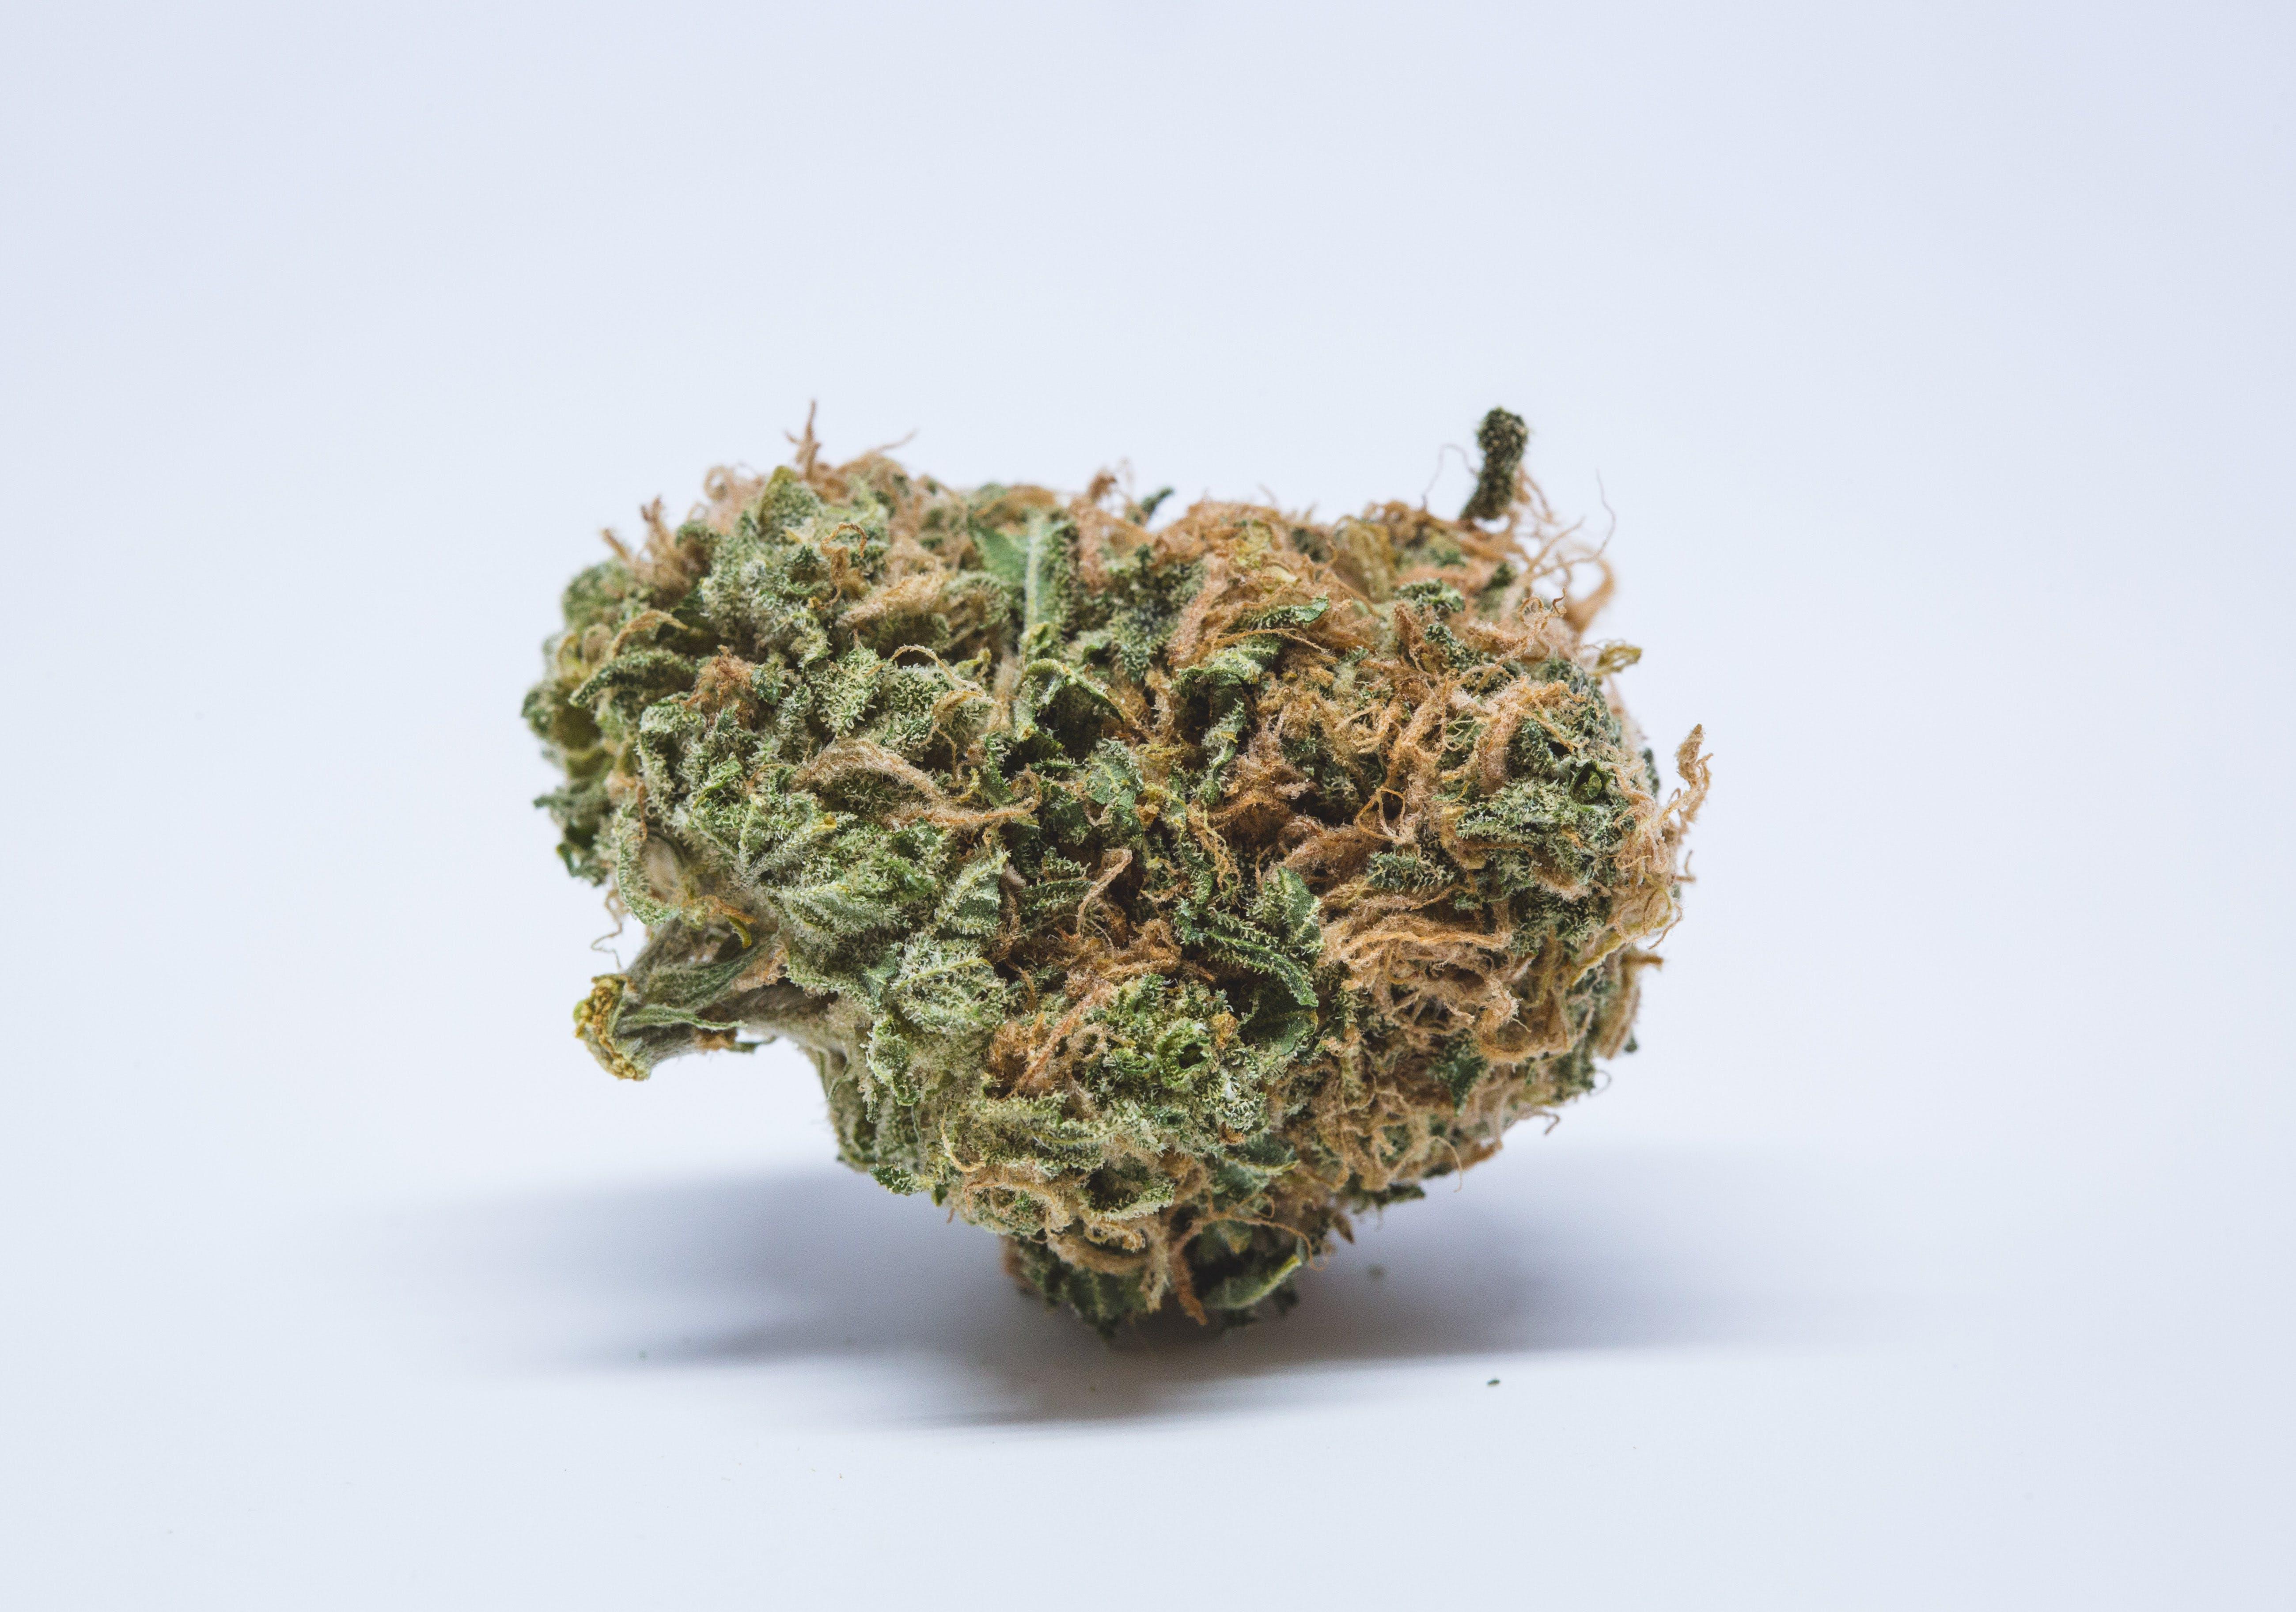 Banana Kush Weed; Banana Kush Cannabis Strain; Banana Kush Hybrid Marijuana Strain